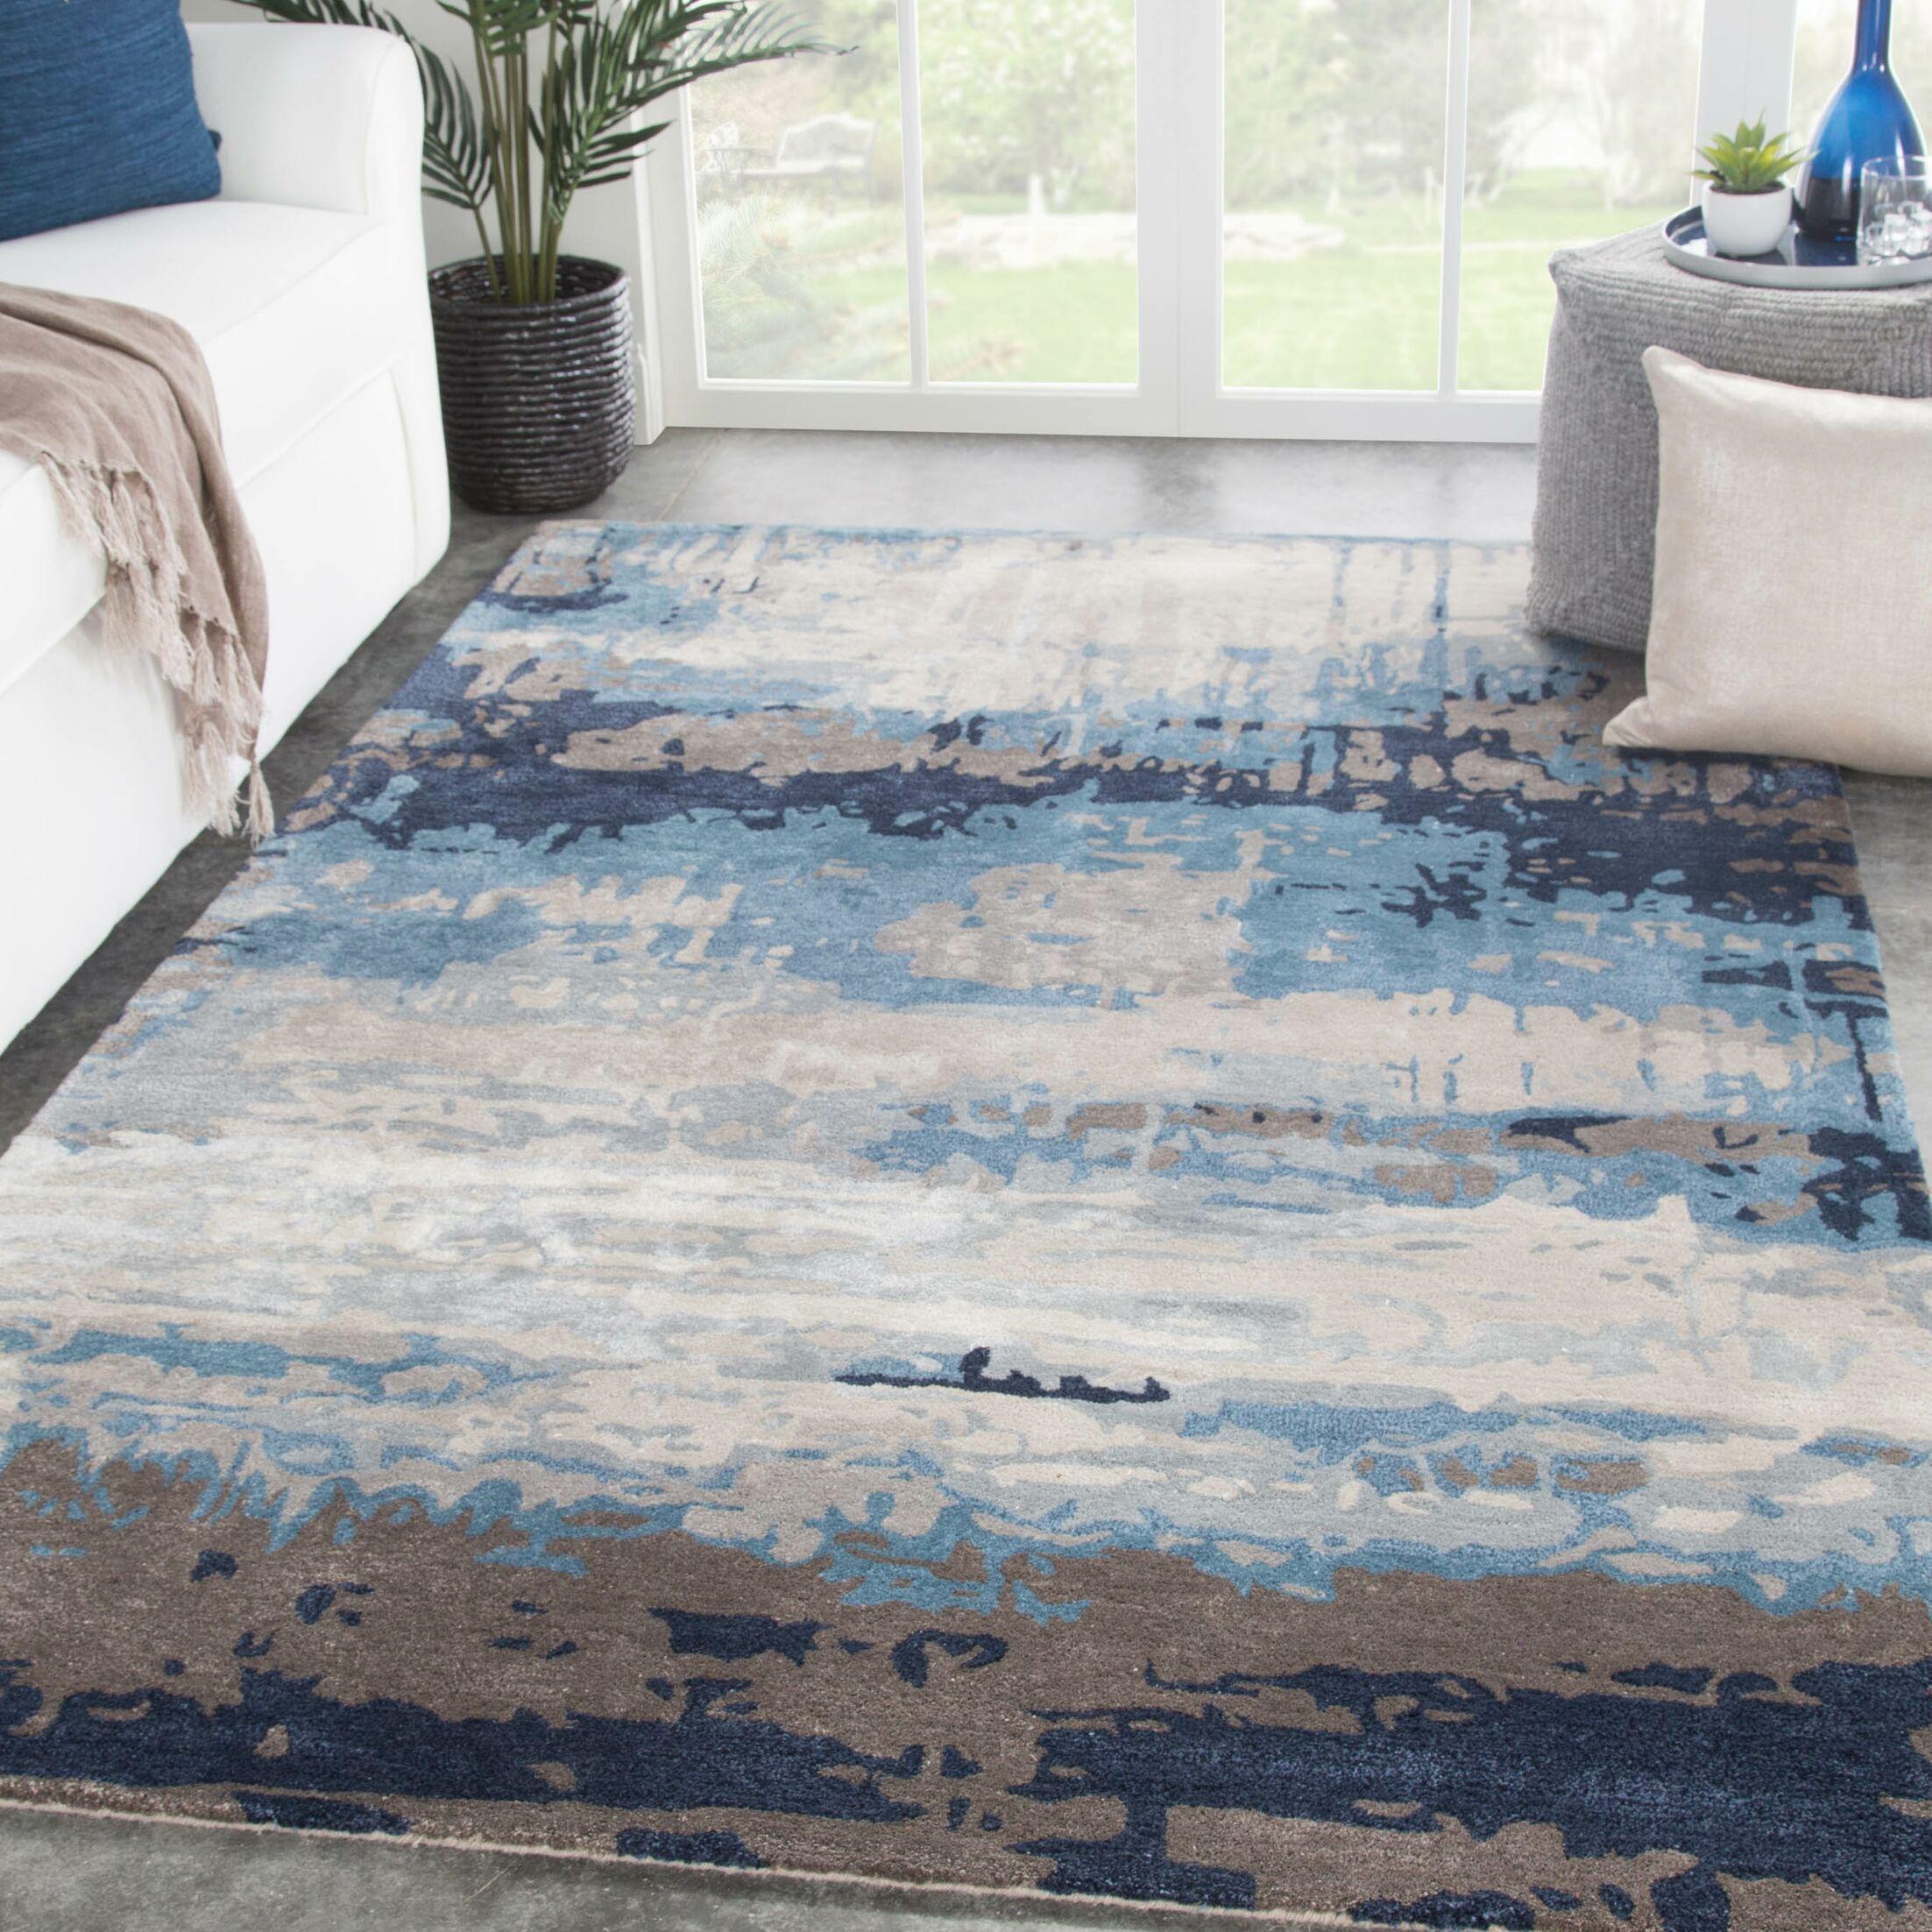 Fairmount Abstract Hand-Tufted Blue/Gray Area Rug Rug Size: Rectangle 5' x 8'